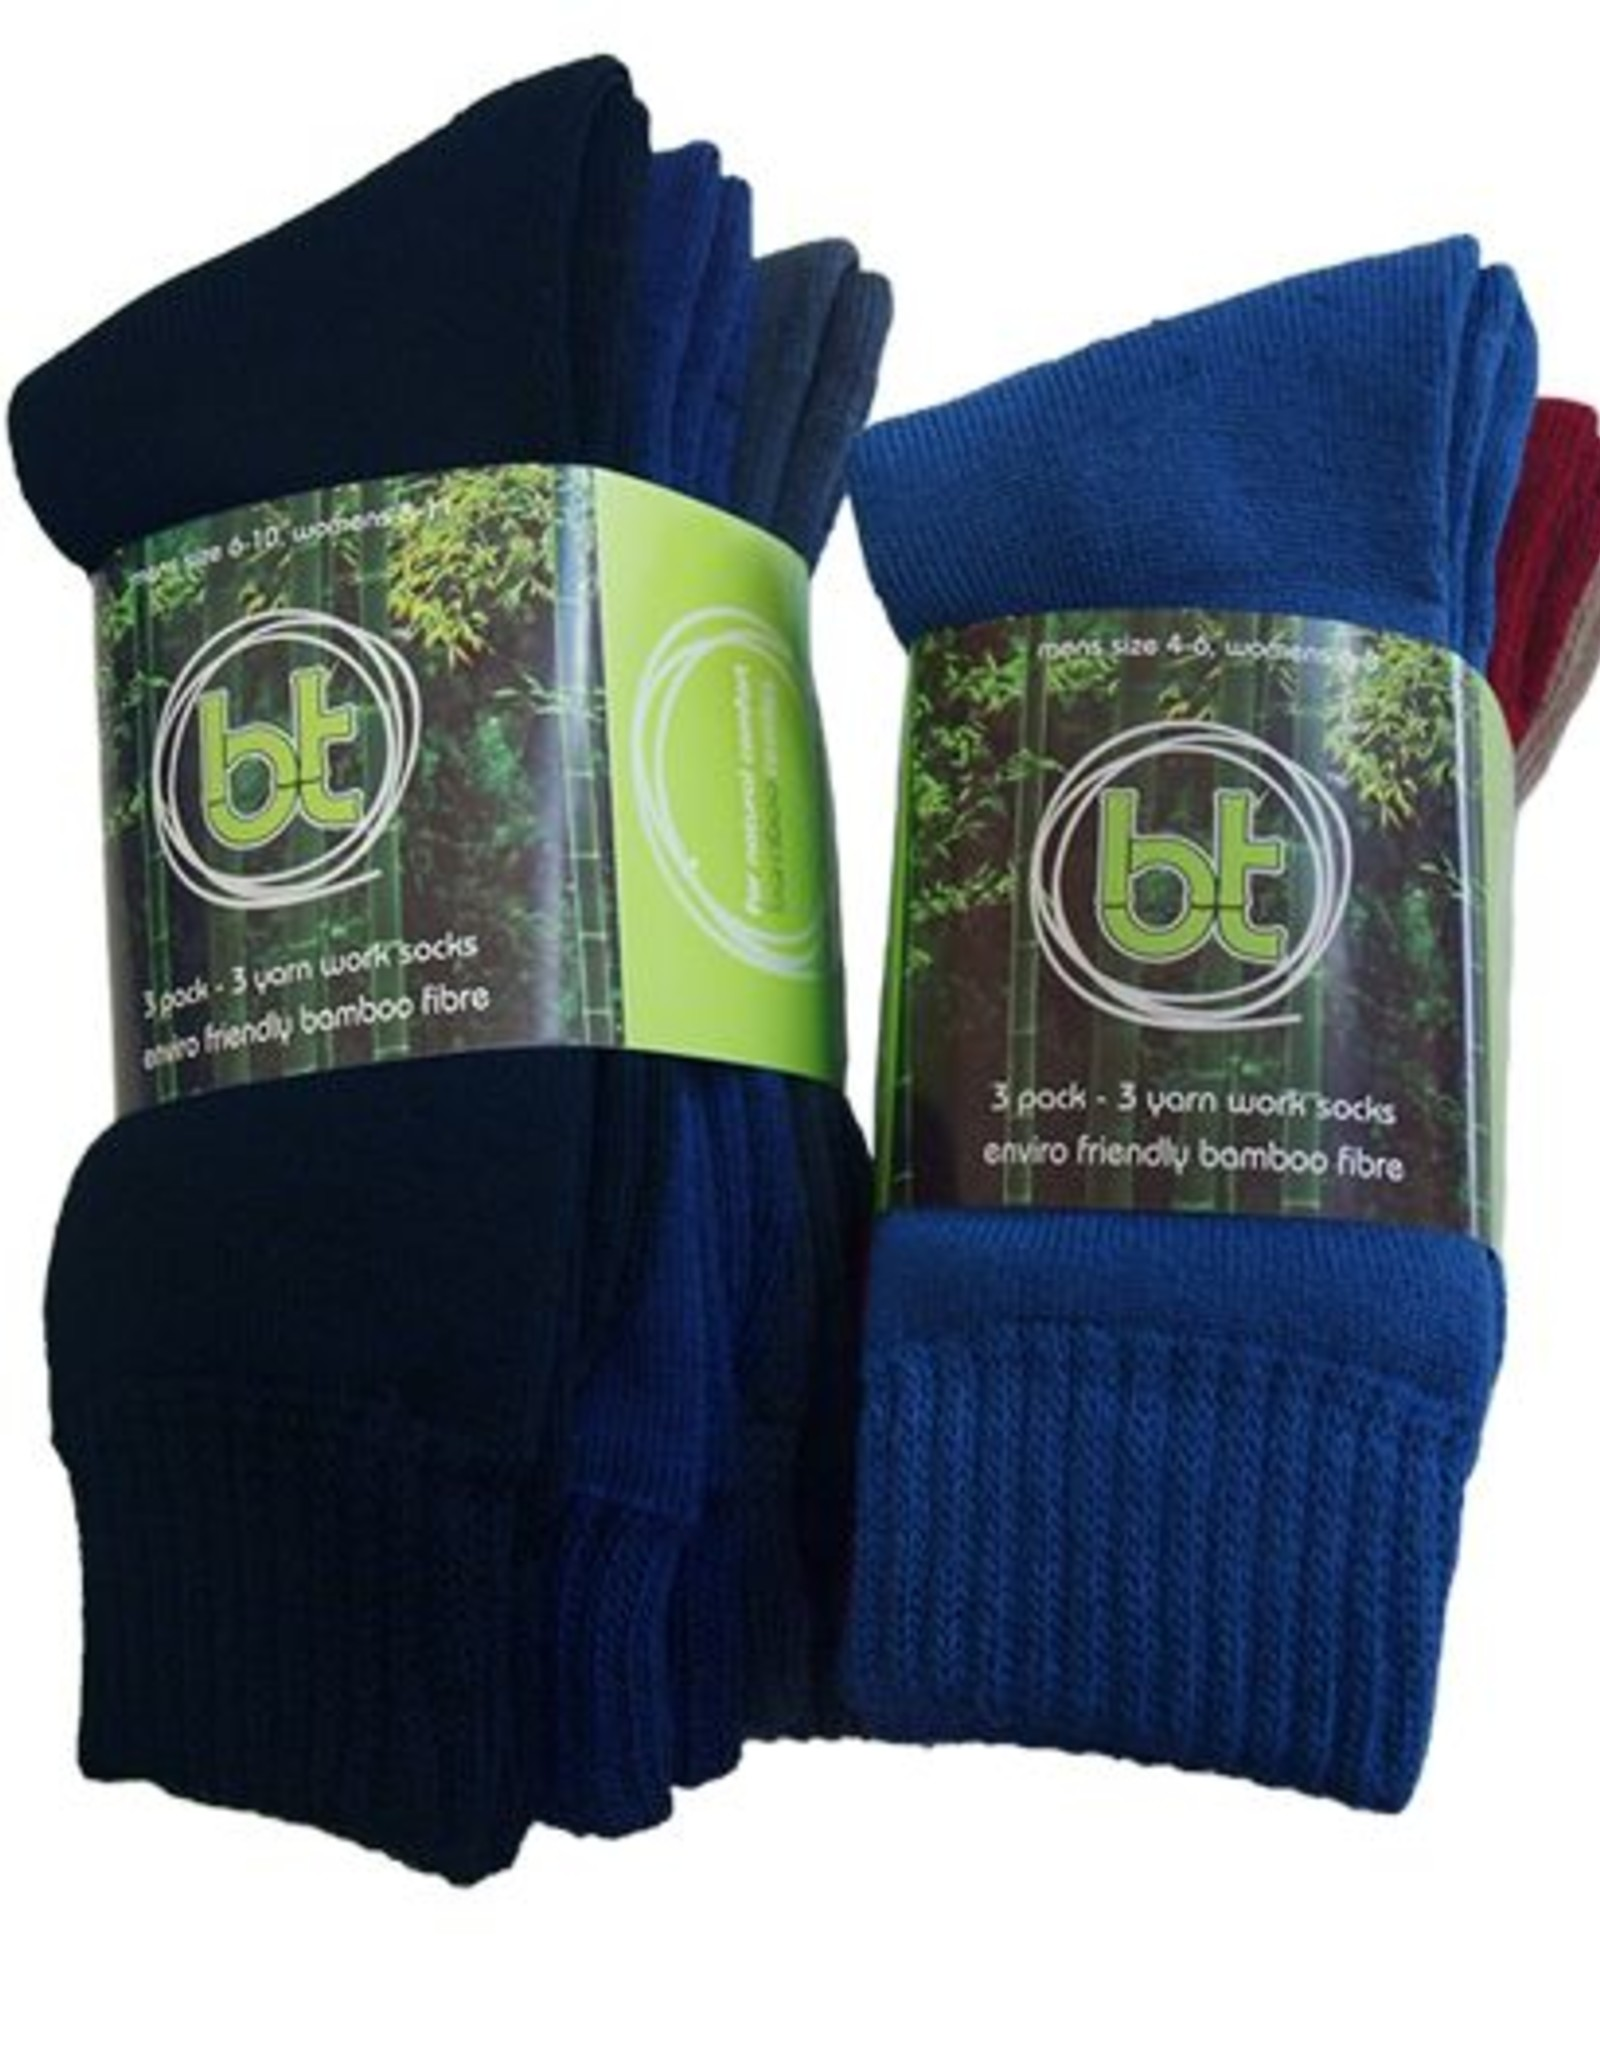 Bamboo Textiles BT Bamboo 3 Yarn Work Socks 3 Pack